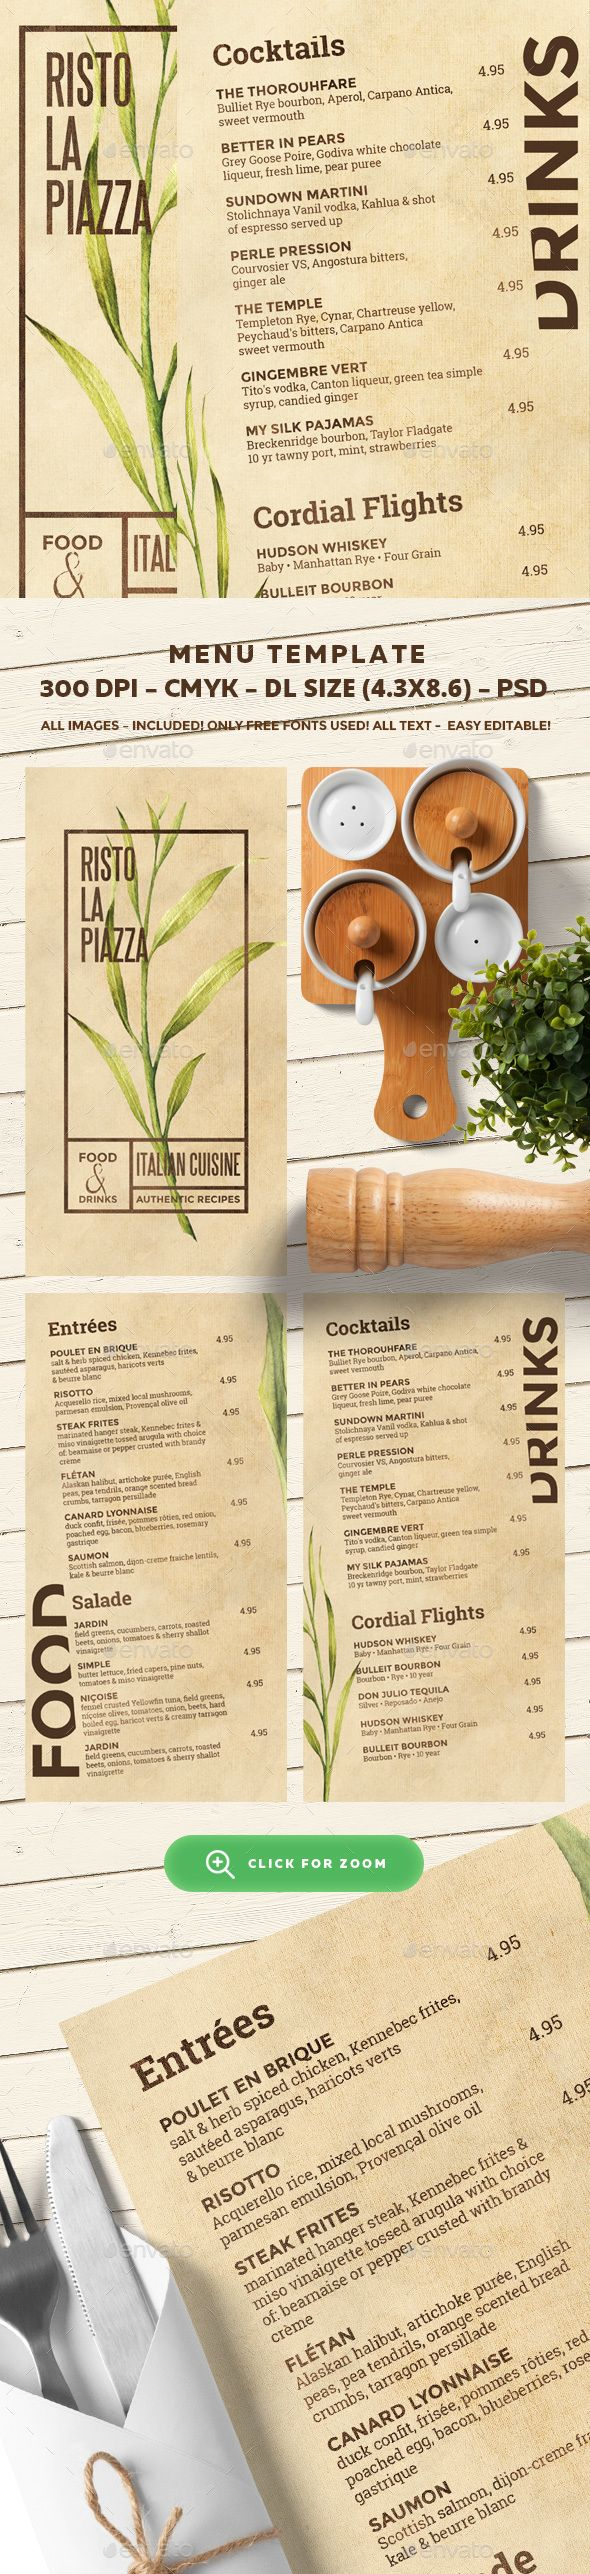 Restaurant Menu Template PSD. Download here: http://graphicriver.net/item/restaurant-menu-template/16704191?ref=ksioks